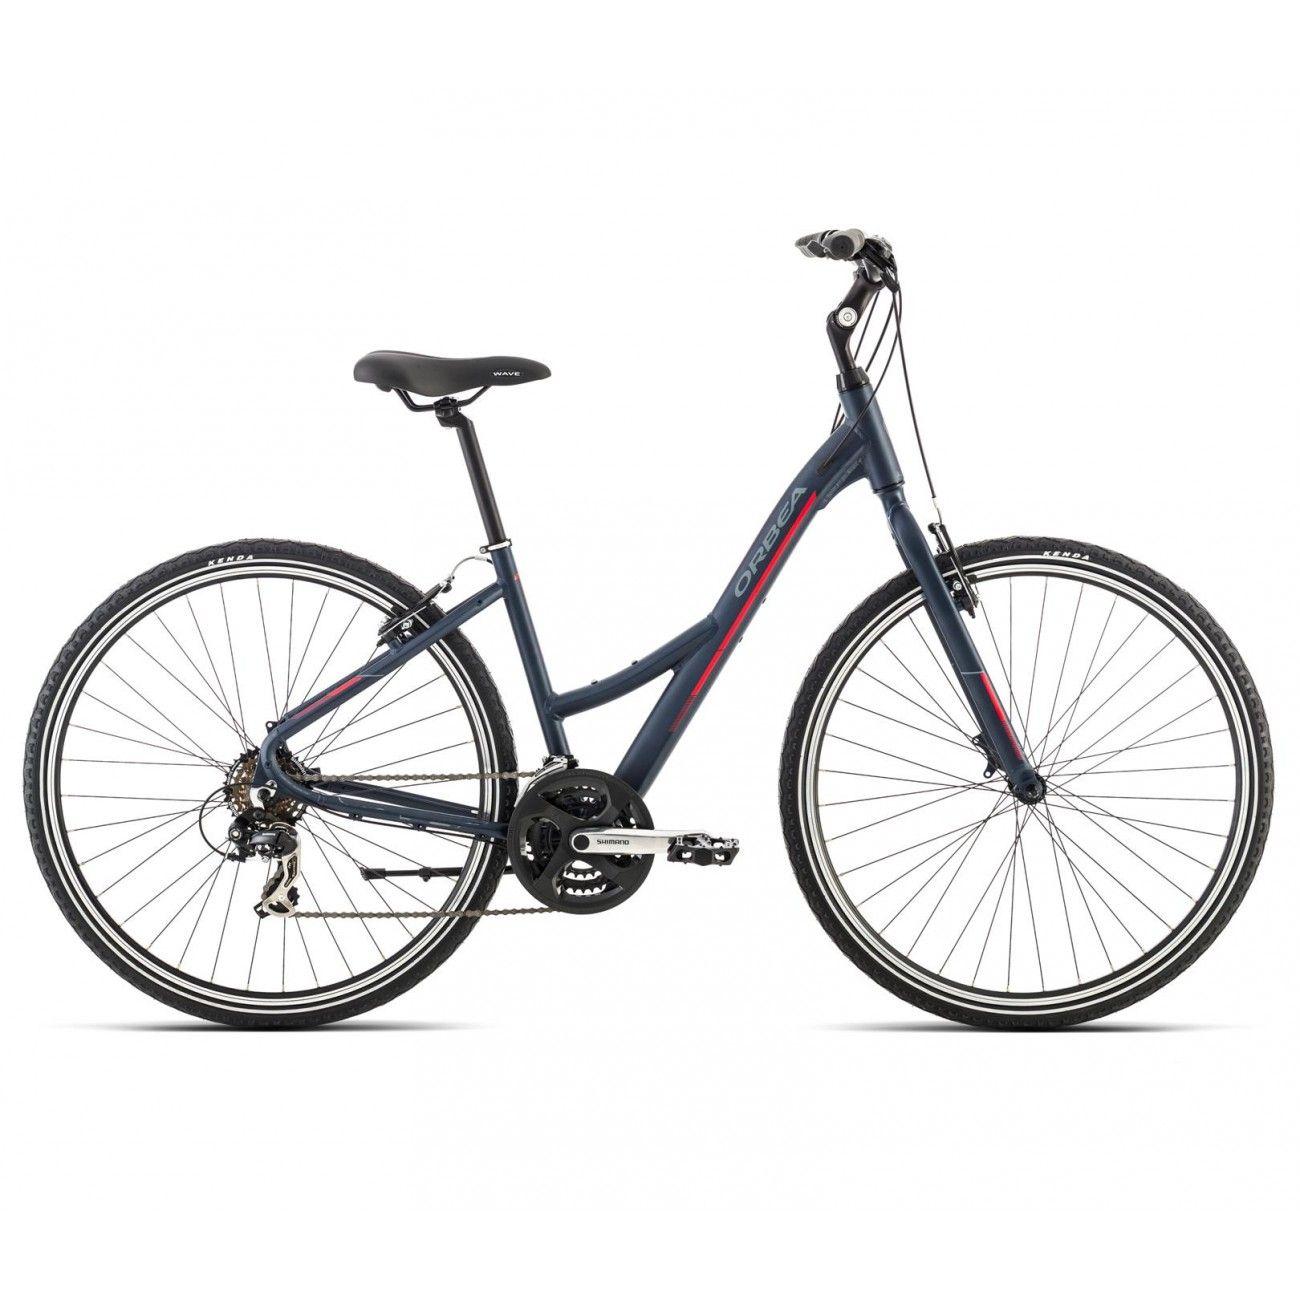 Singlespeed Bikes Shop | bei google-anahytic.com gnstig